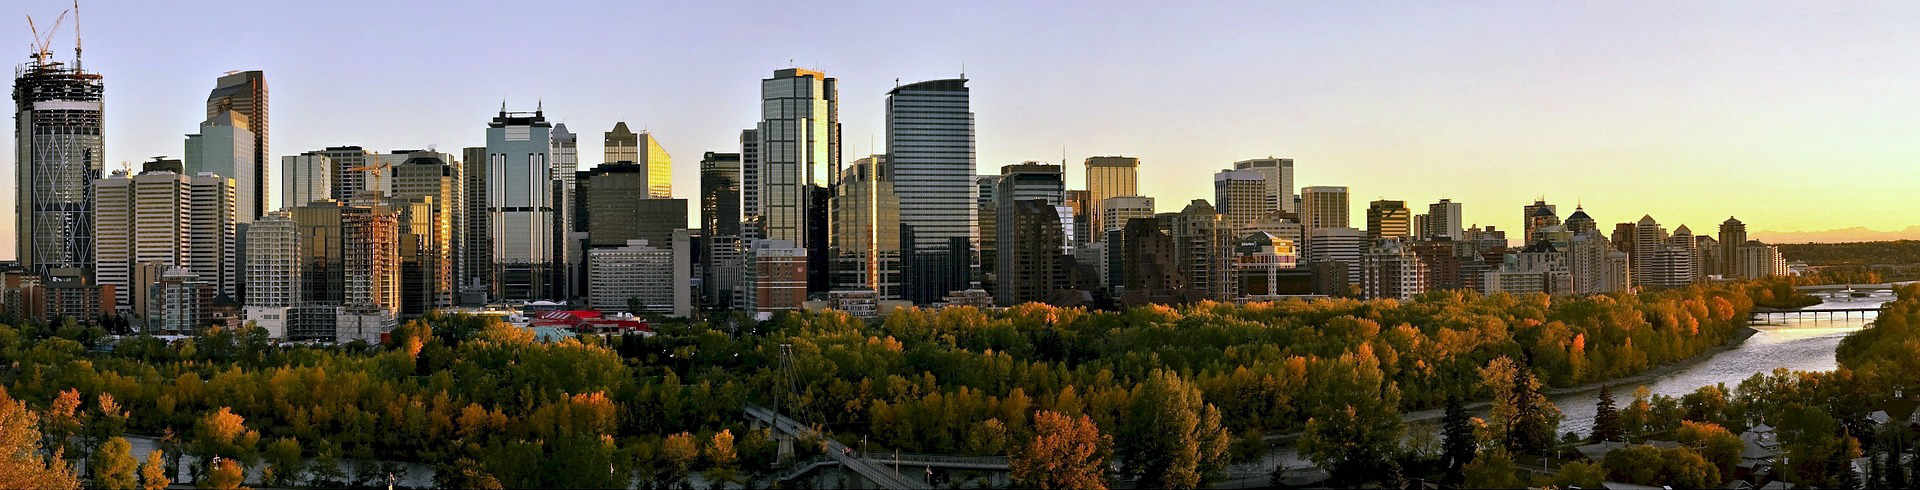 Calgary Skyline, Alberta, Canada